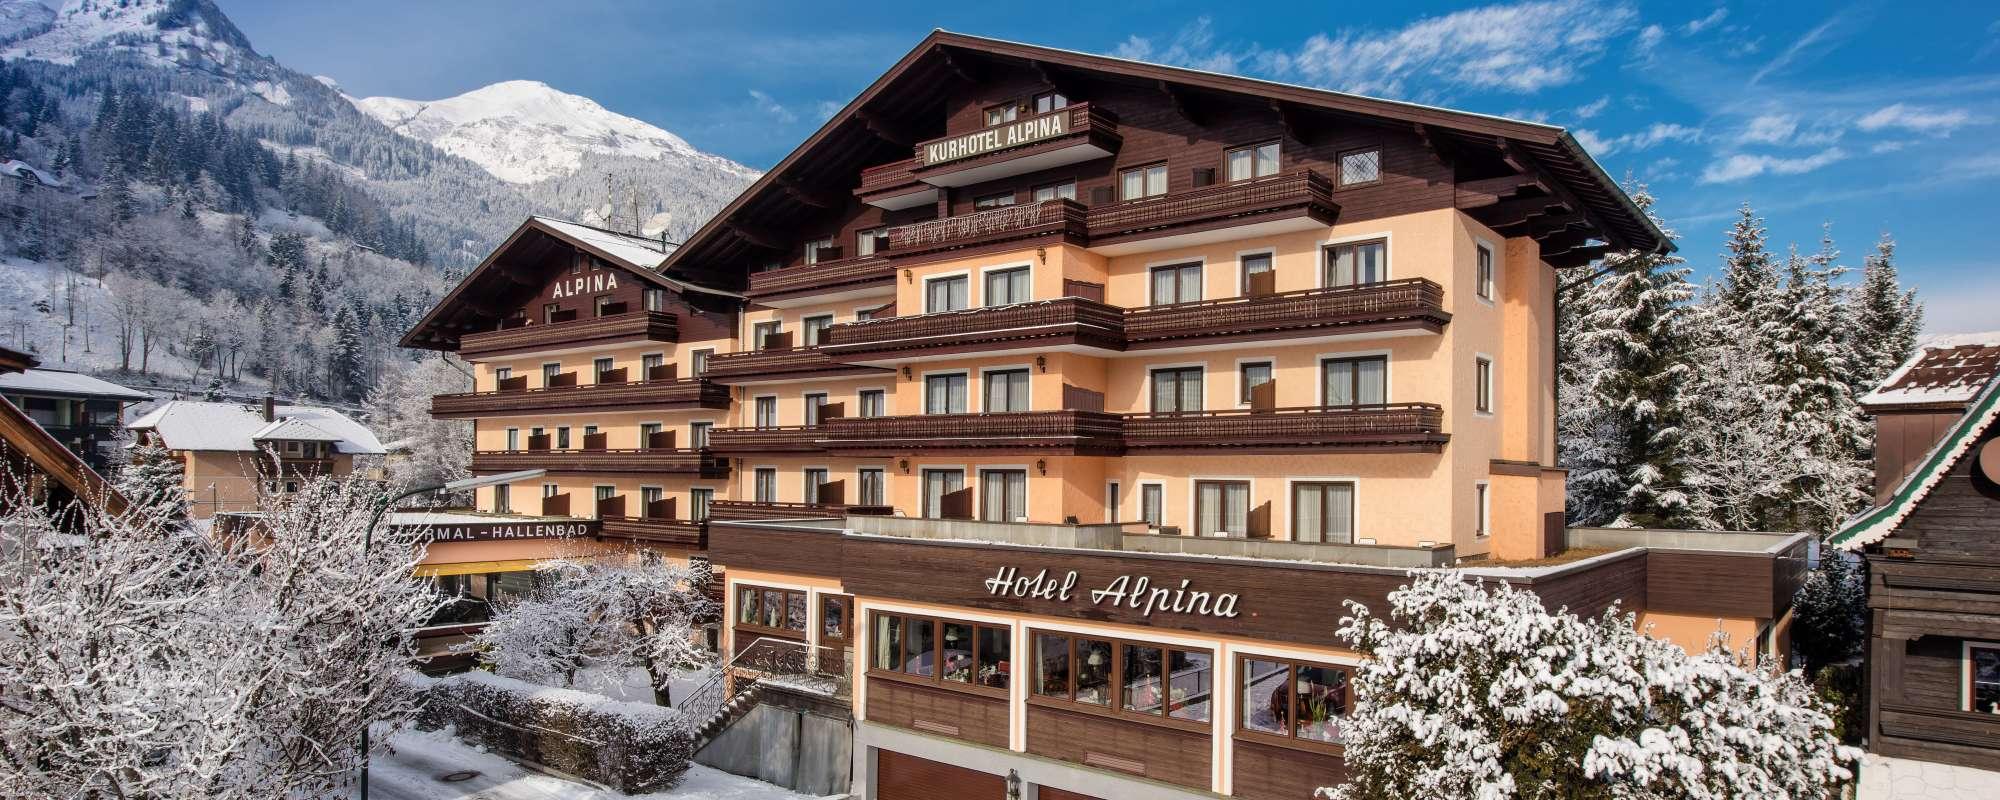 Alpina Hotel 4 Hotel Alpina In Bad Hofgastein Skiing Holidays And Spa